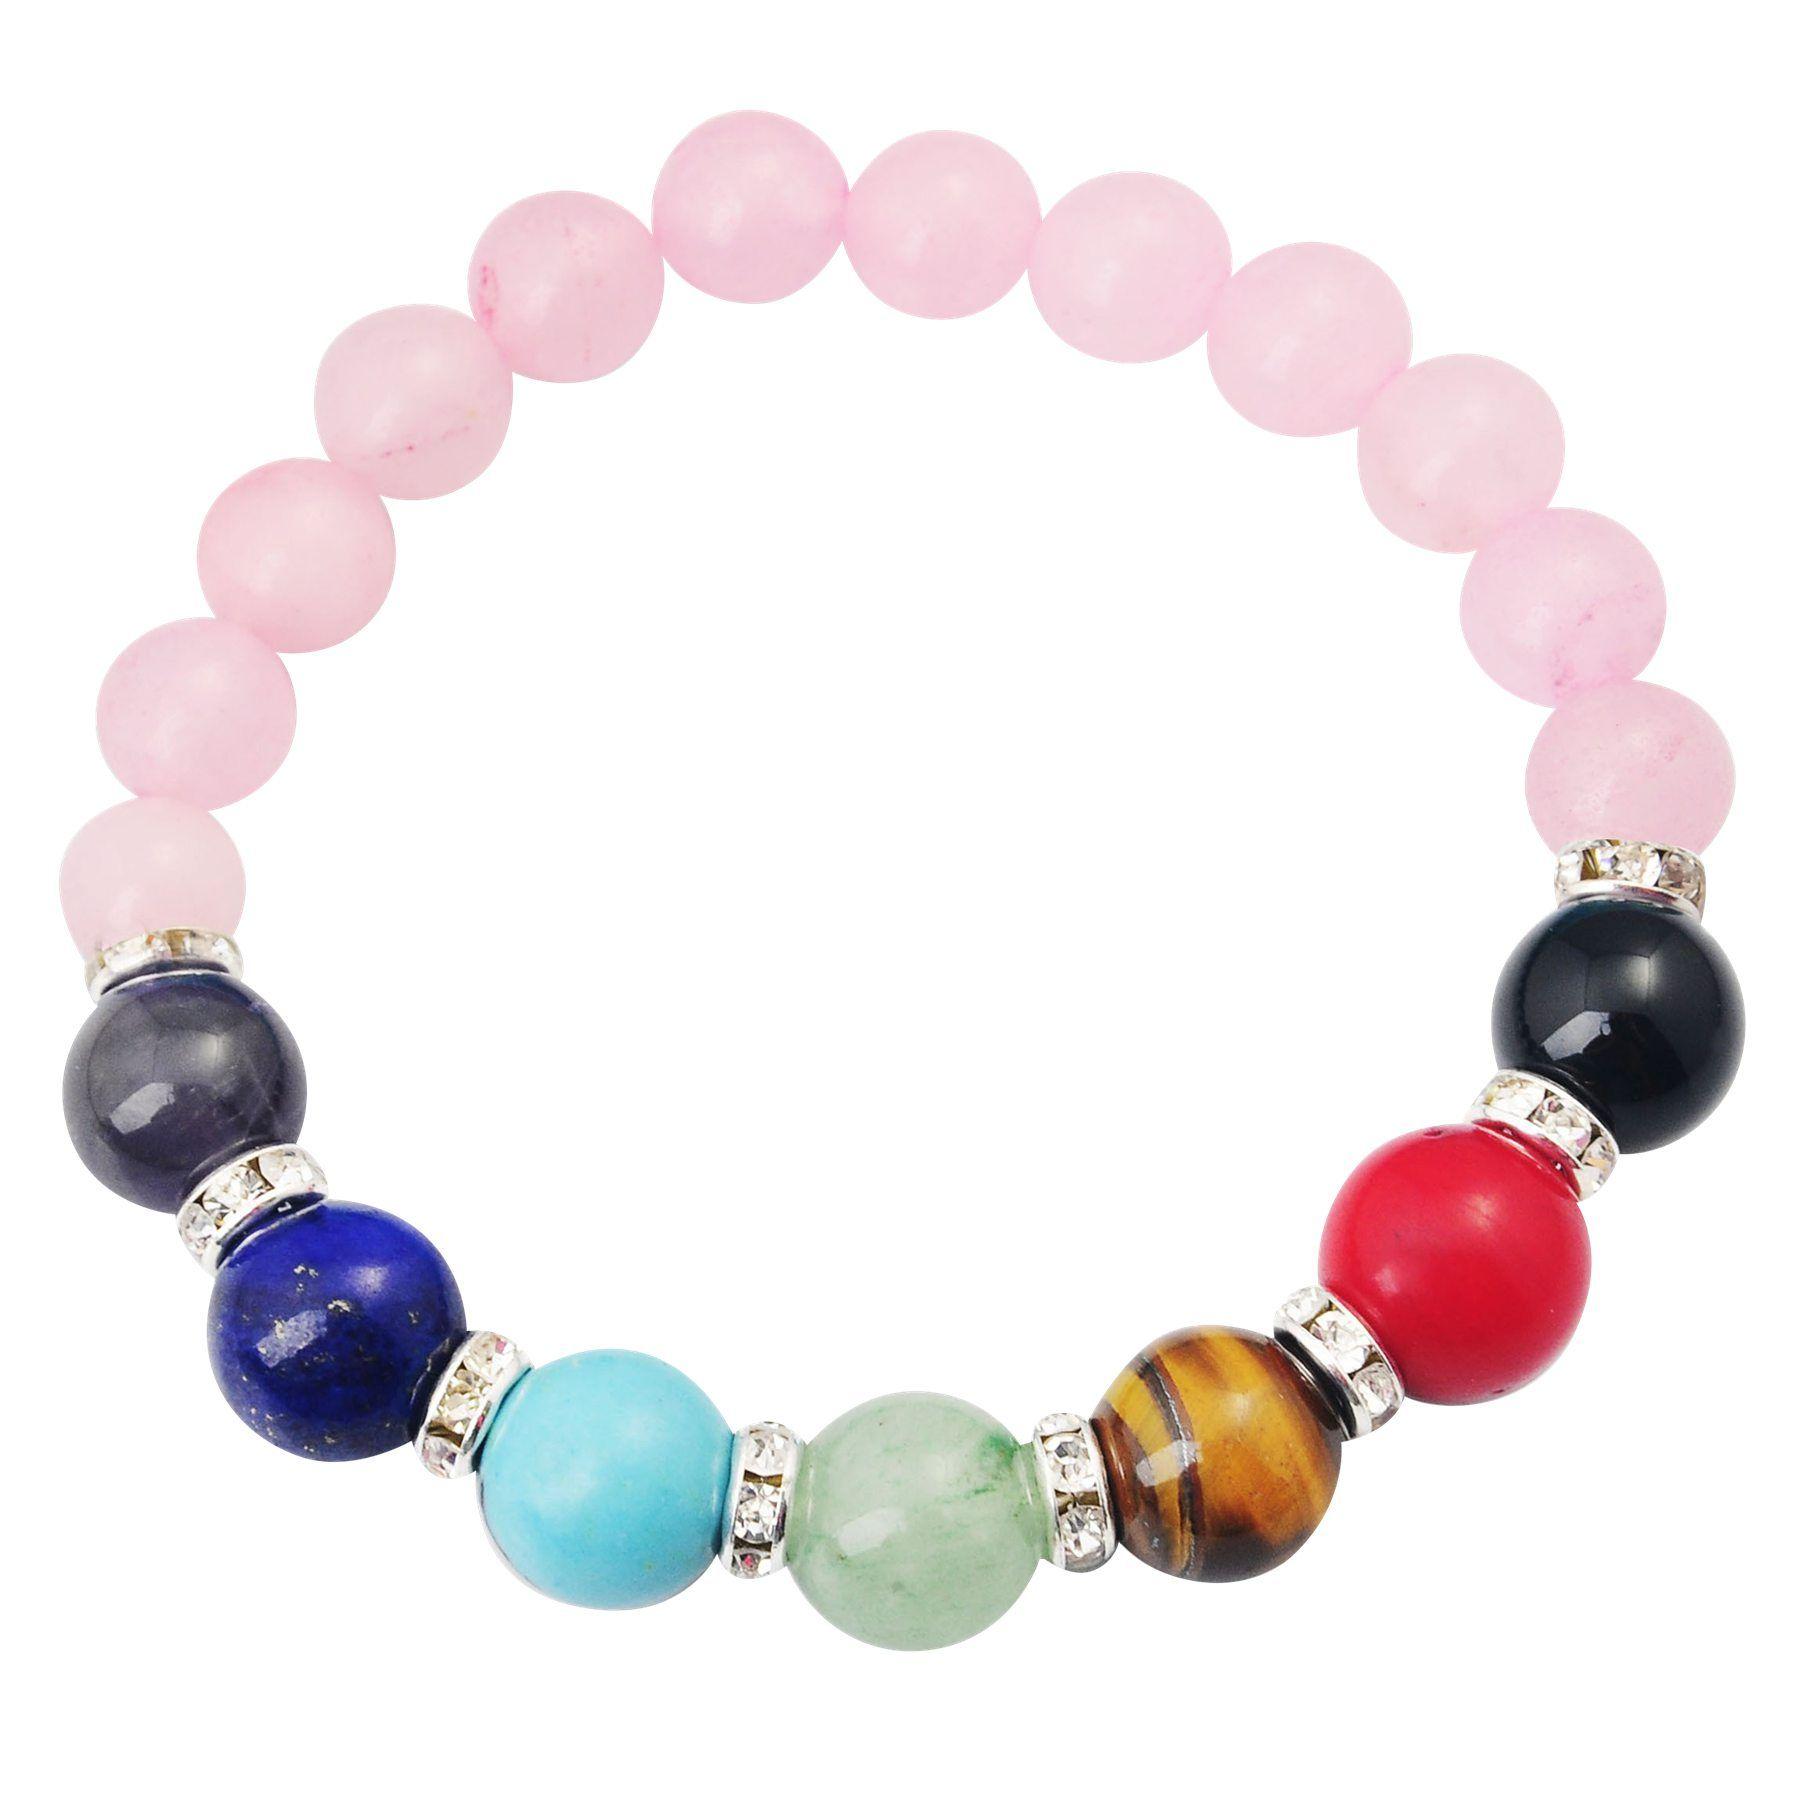 Joya Gift 14SB1037-8MM Natural Rose Quartz Beads bracelet 7 Chakra Gemstone Crystal Healing Reiki women jewelry bangle Free Shipping